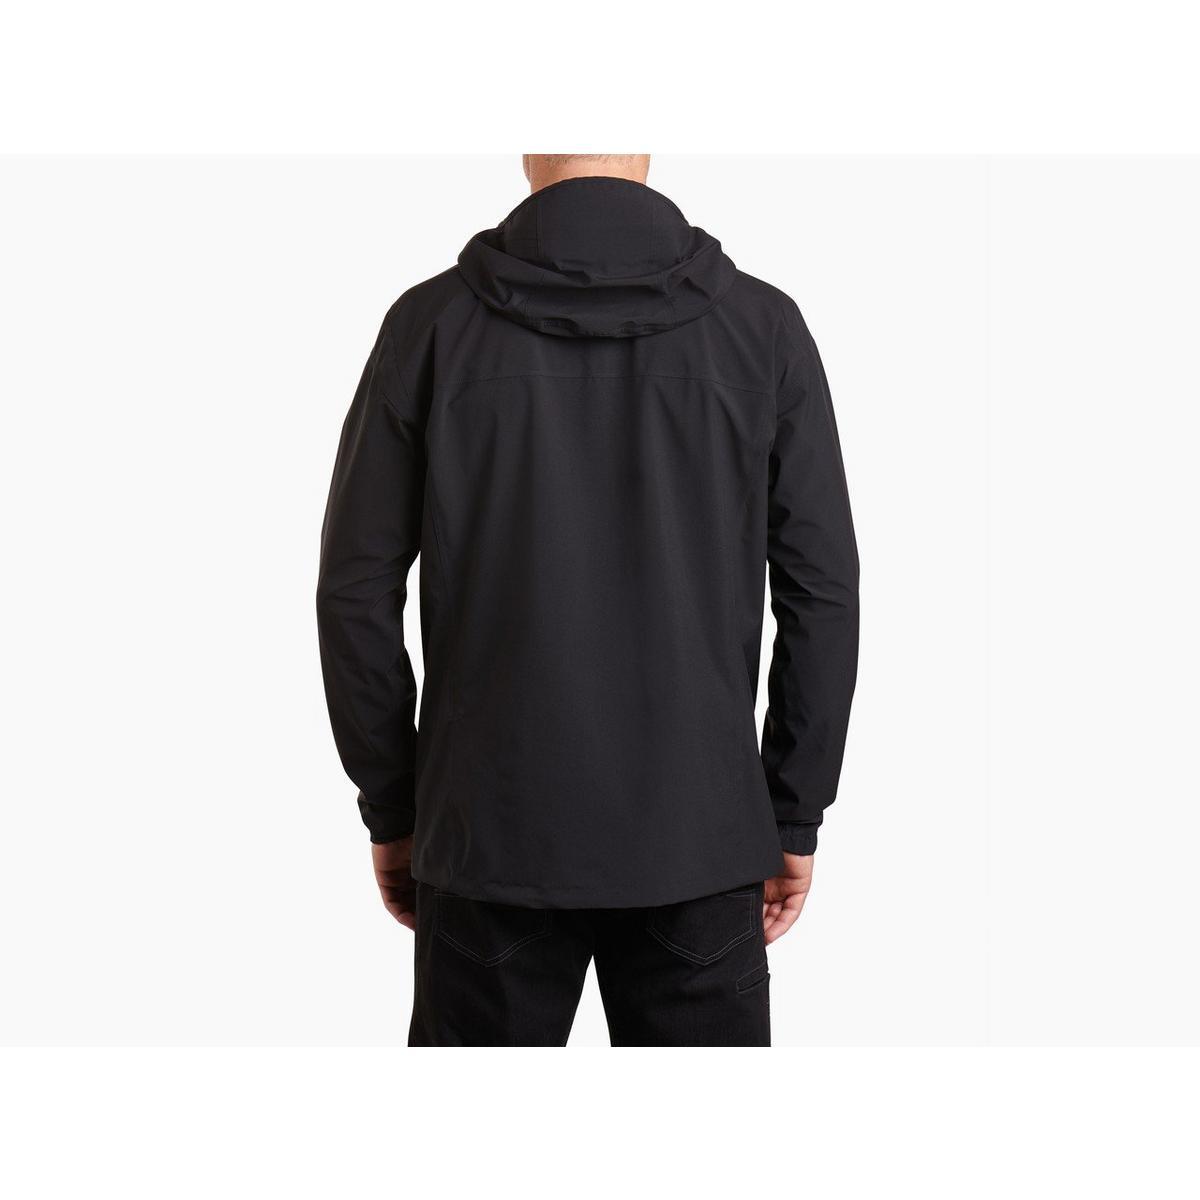 Kuhl Men's Stretch Voyagr Waterproof Jacket - Black